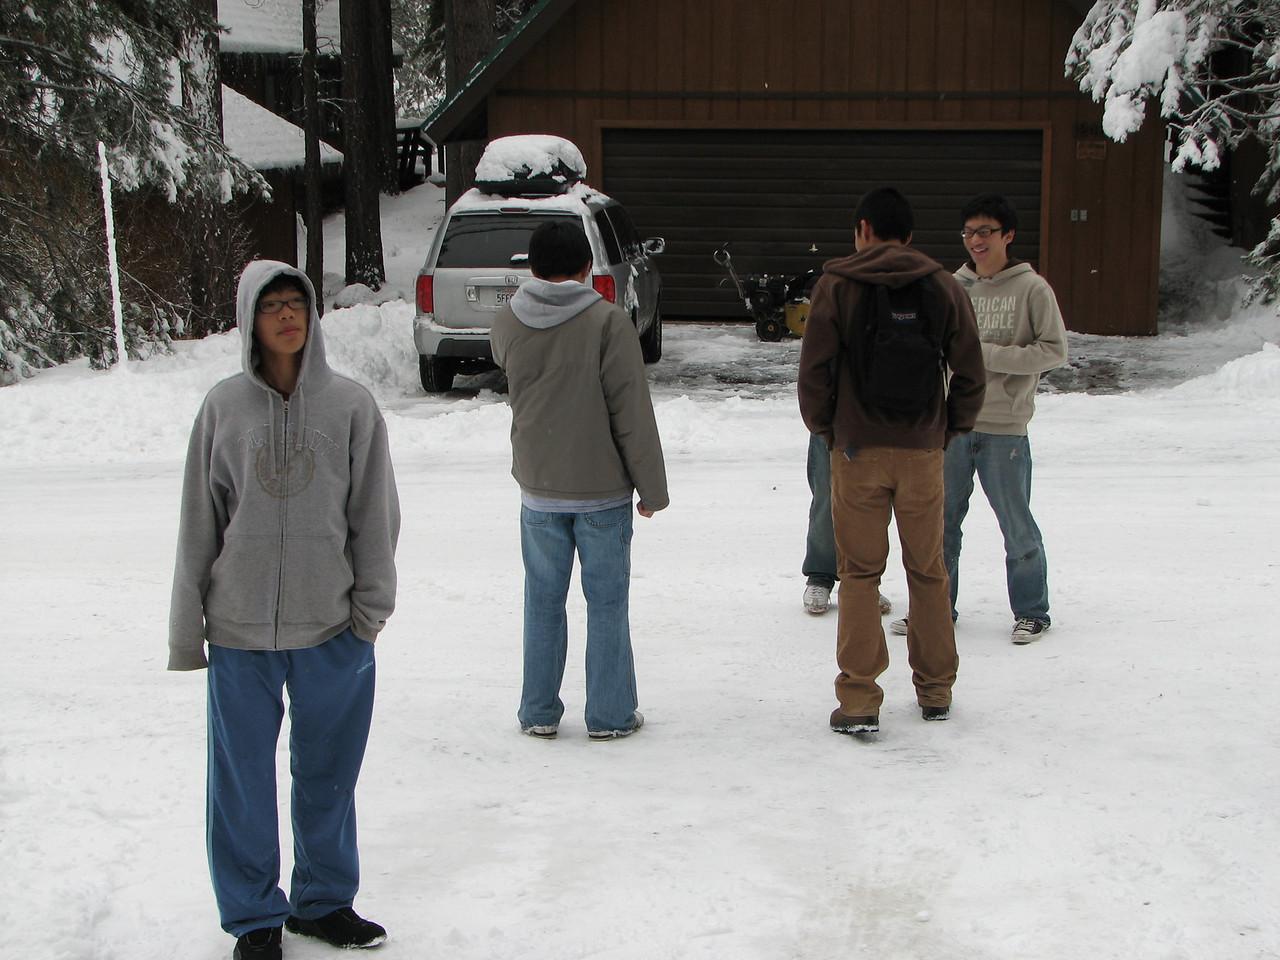 2006 12 23 Sat - Jeremy Hsu, Paul & Doug Kang, and Jimmy Lee outside